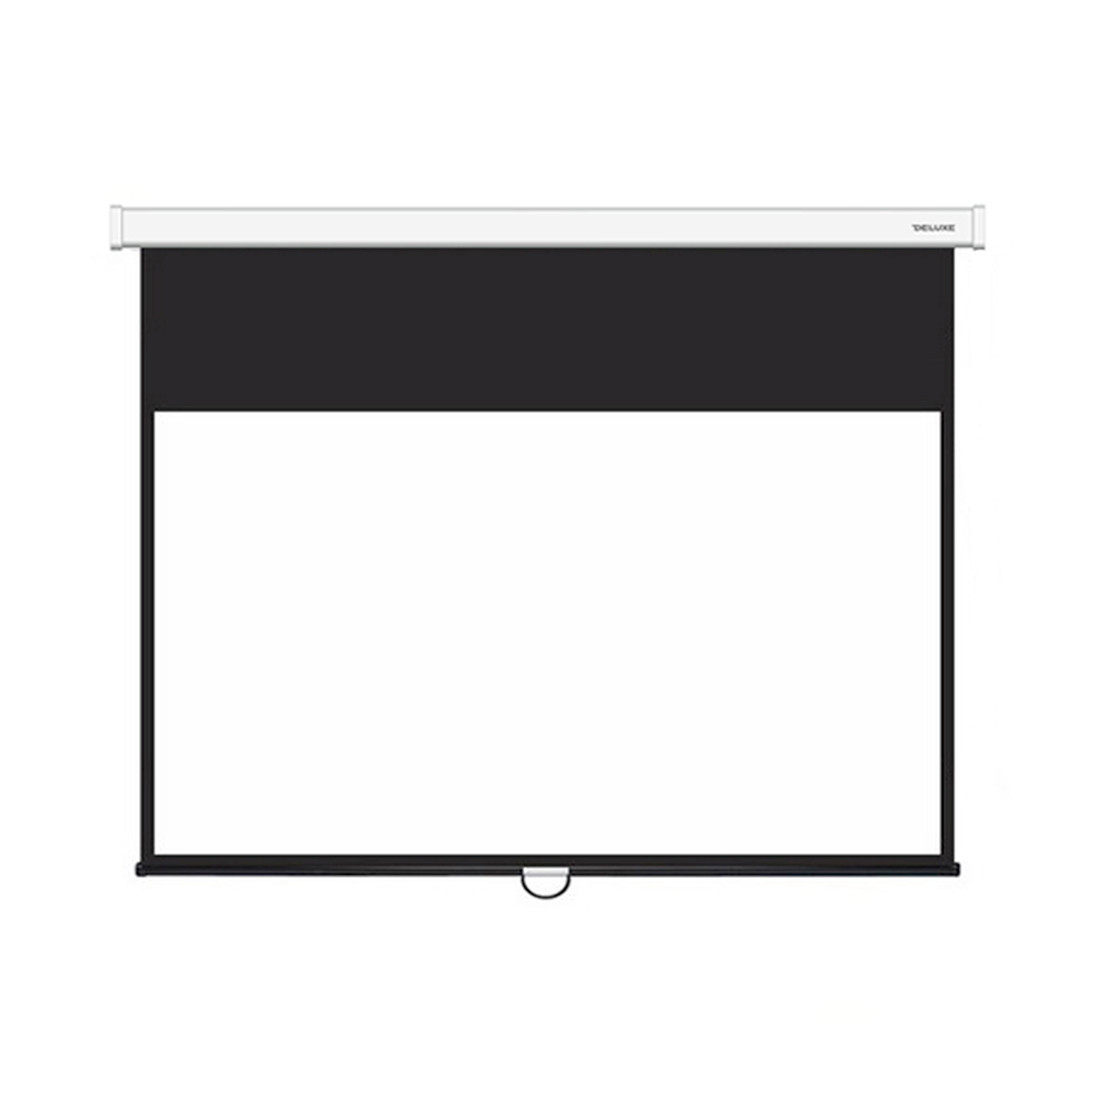 Экран Deluxe DLS-M300x180W